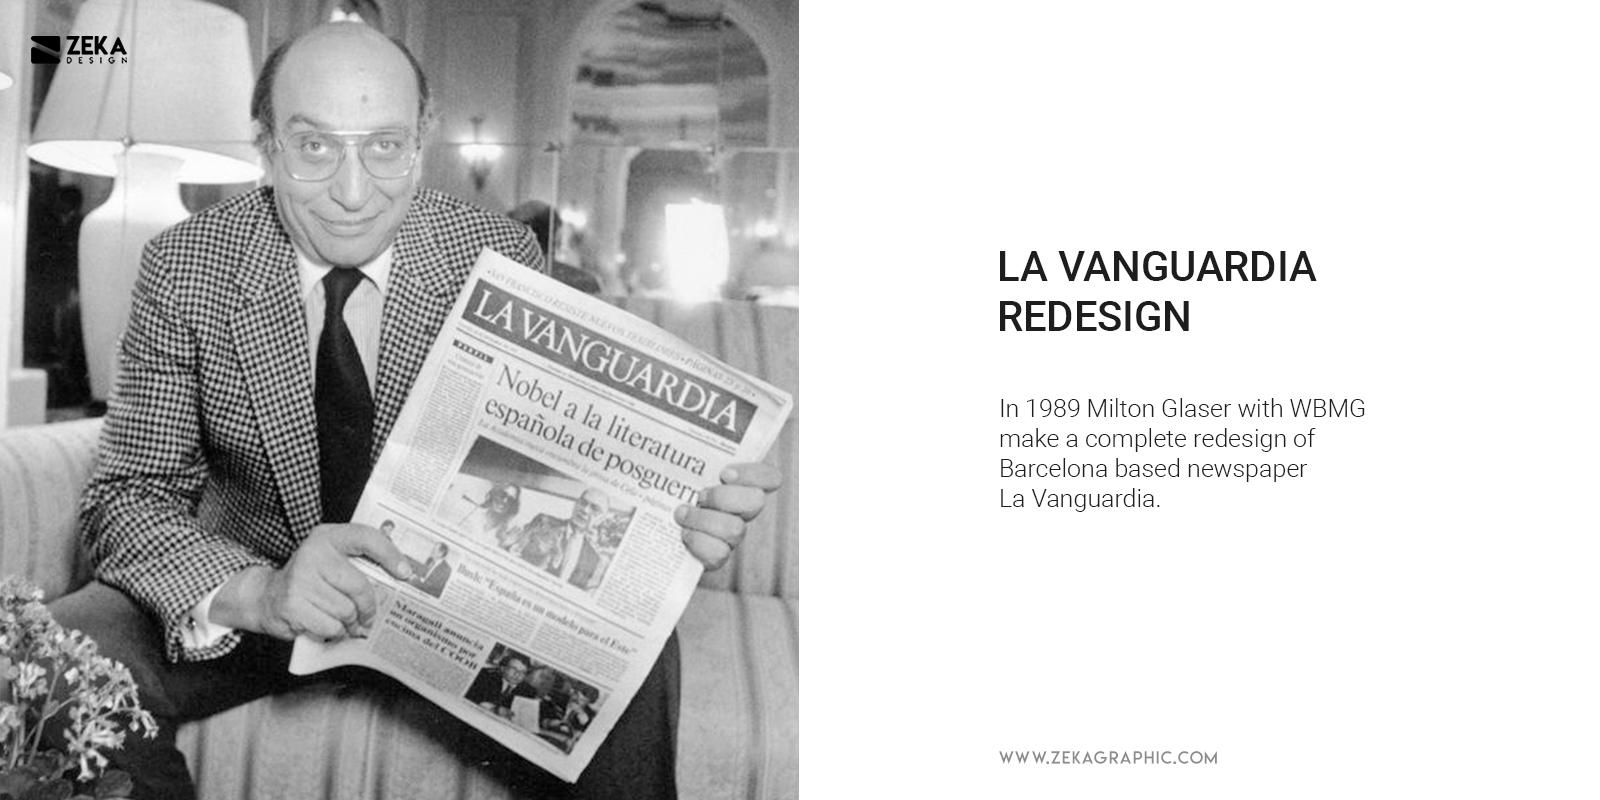 La Vanguardia Redesign By Milton Glaser